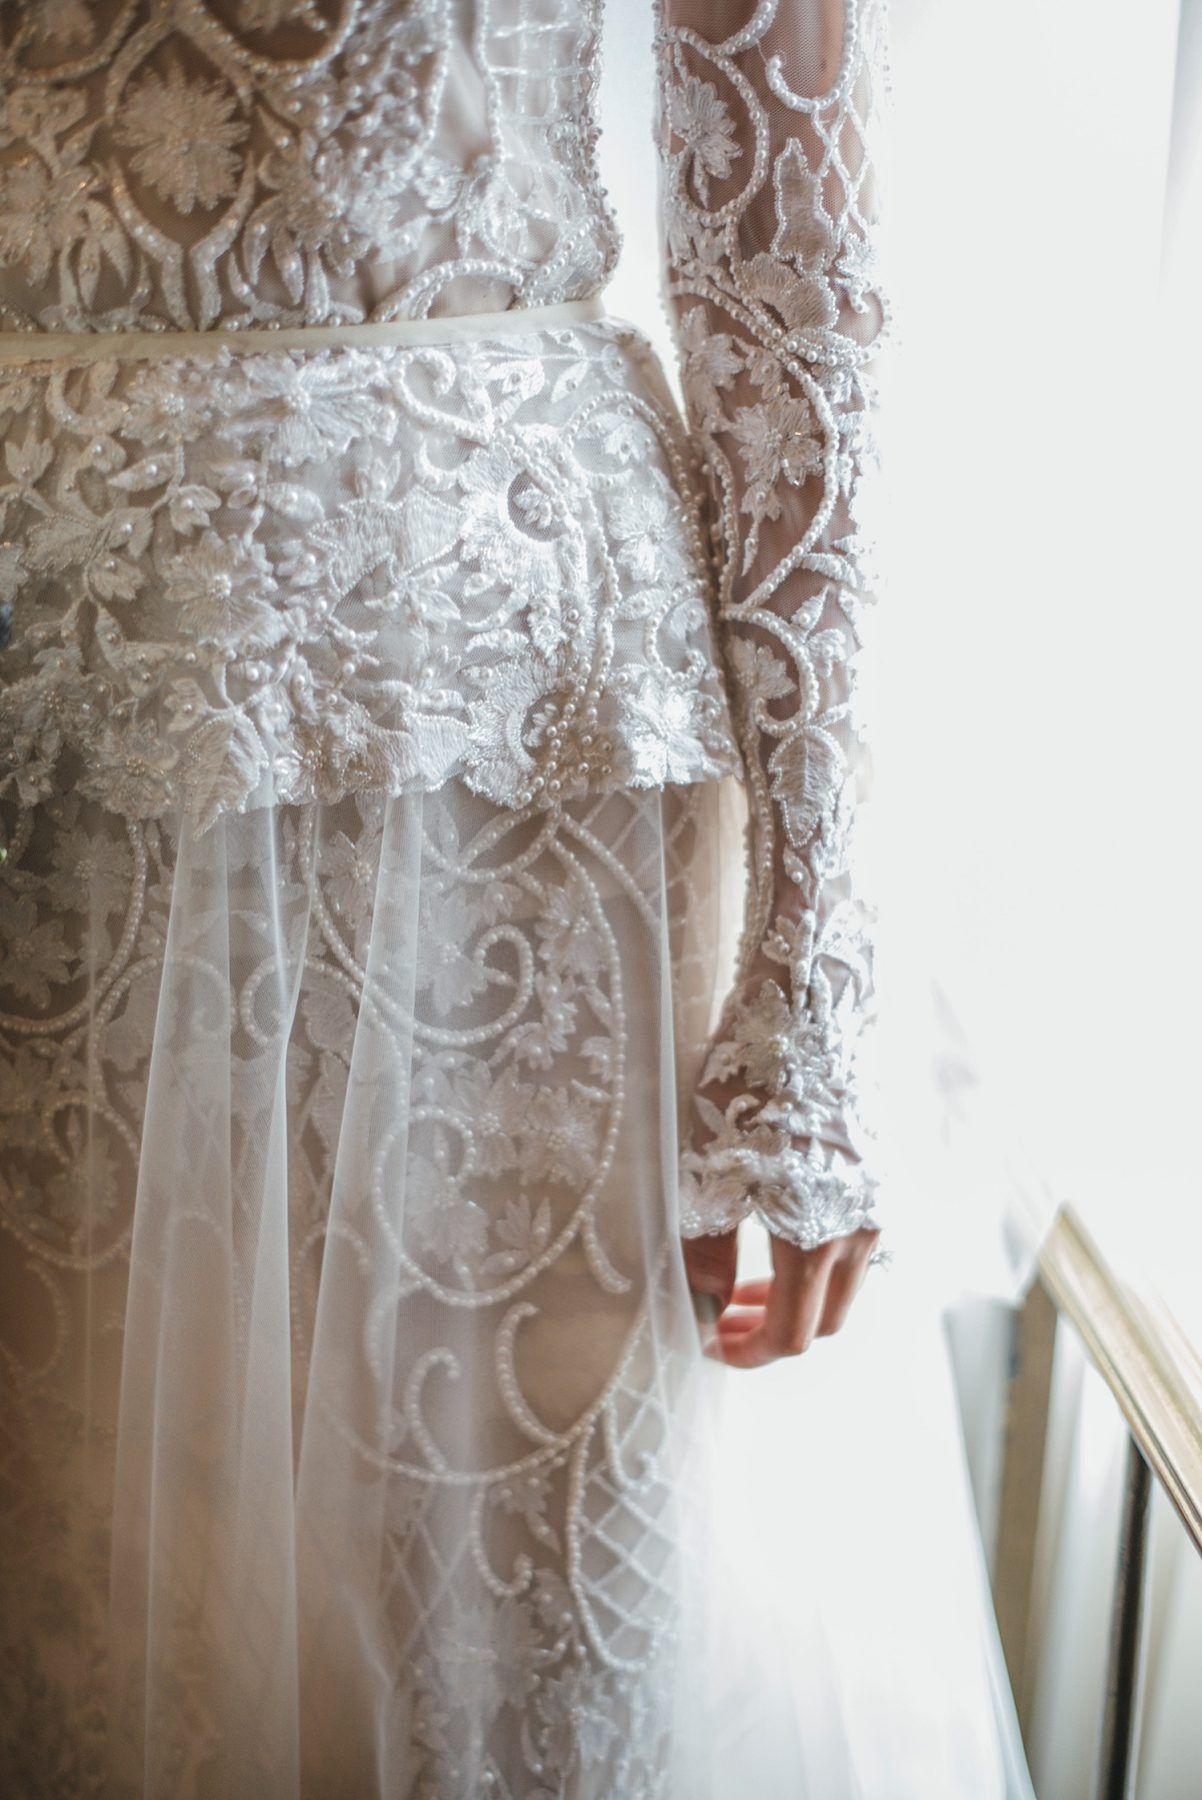 Inspiration Pittsburgh Wedding Ideas From Burgh Brides In 2020 Wedding Dresses Wedding Dress Styles Pittsburgh Wedding Dress,Modest Wedding Dresses Sale